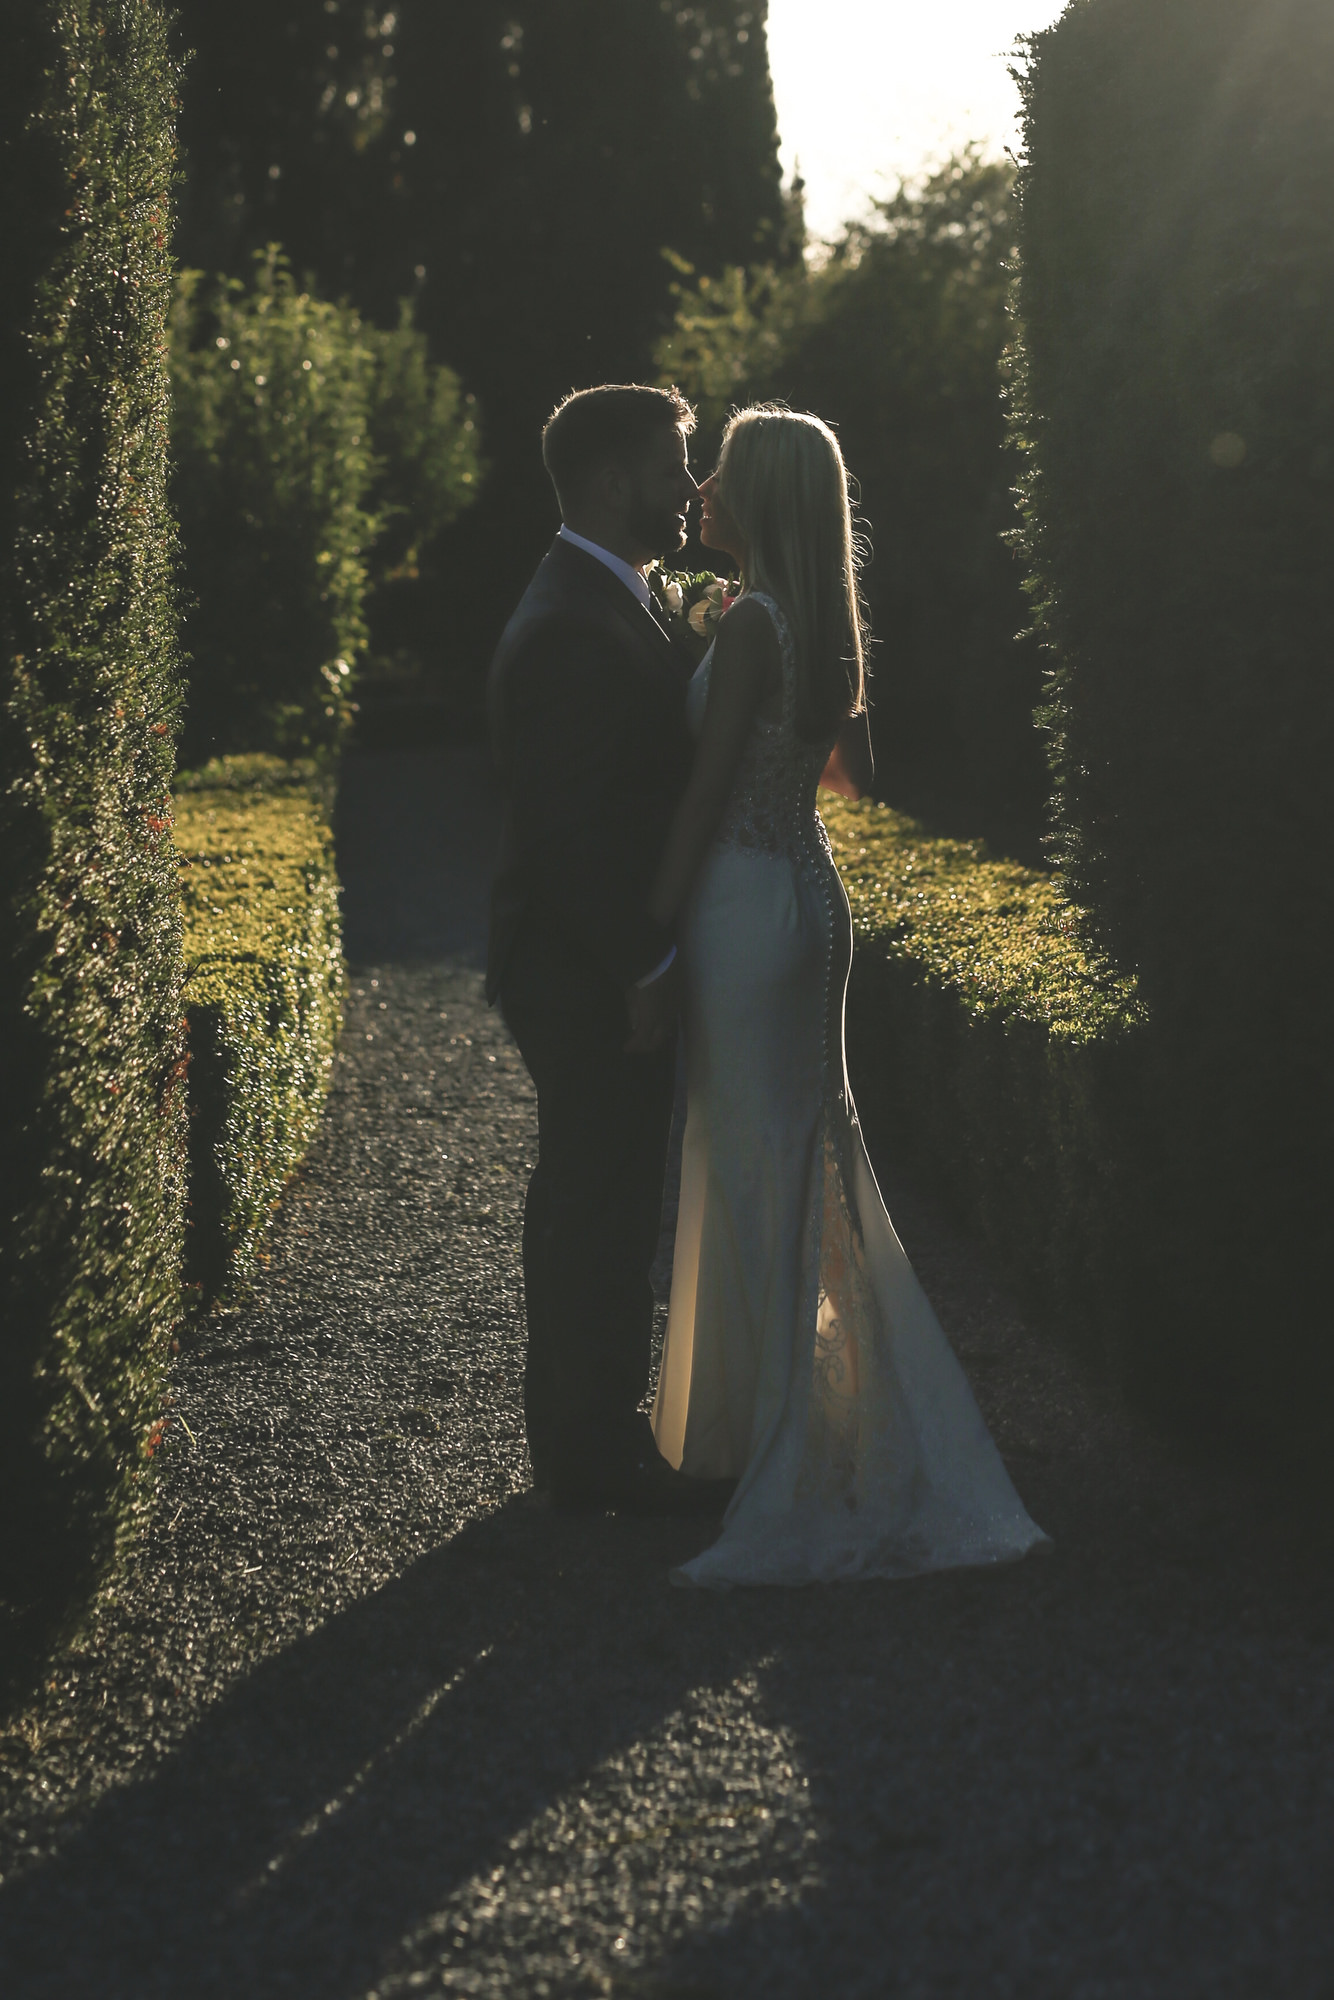 kilkea_castle_wedding_photographer_goldenmoments_044.jpg